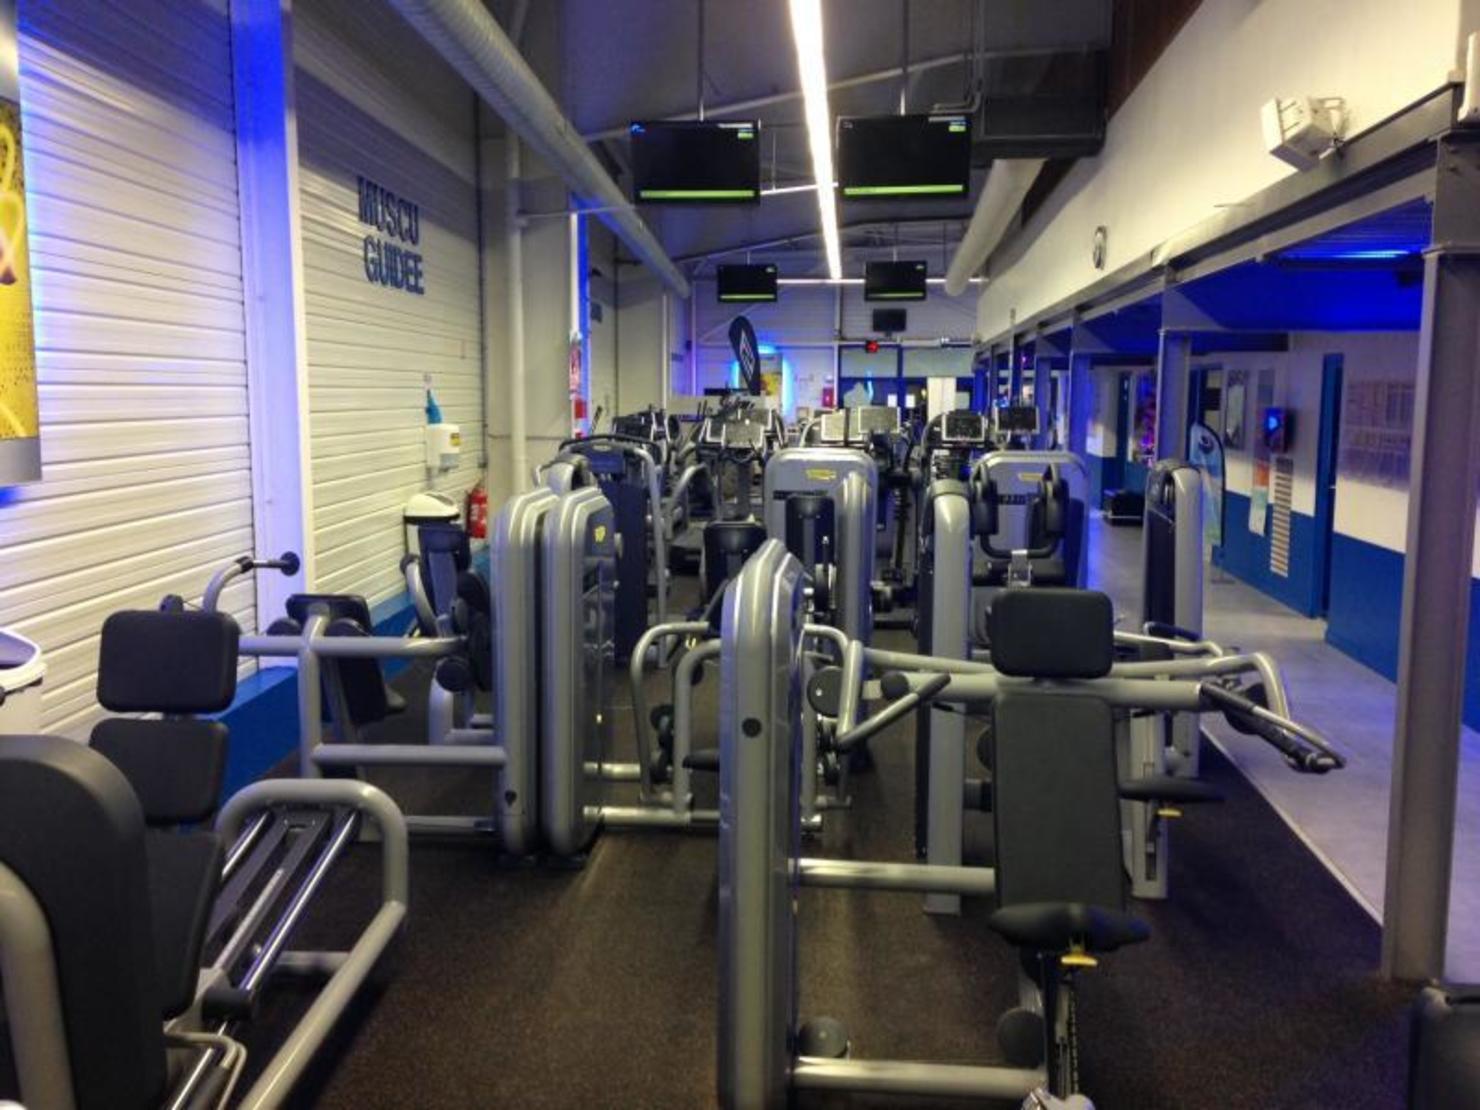 fitness park chambly tarifs avis horaires essai gratuit. Black Bedroom Furniture Sets. Home Design Ideas